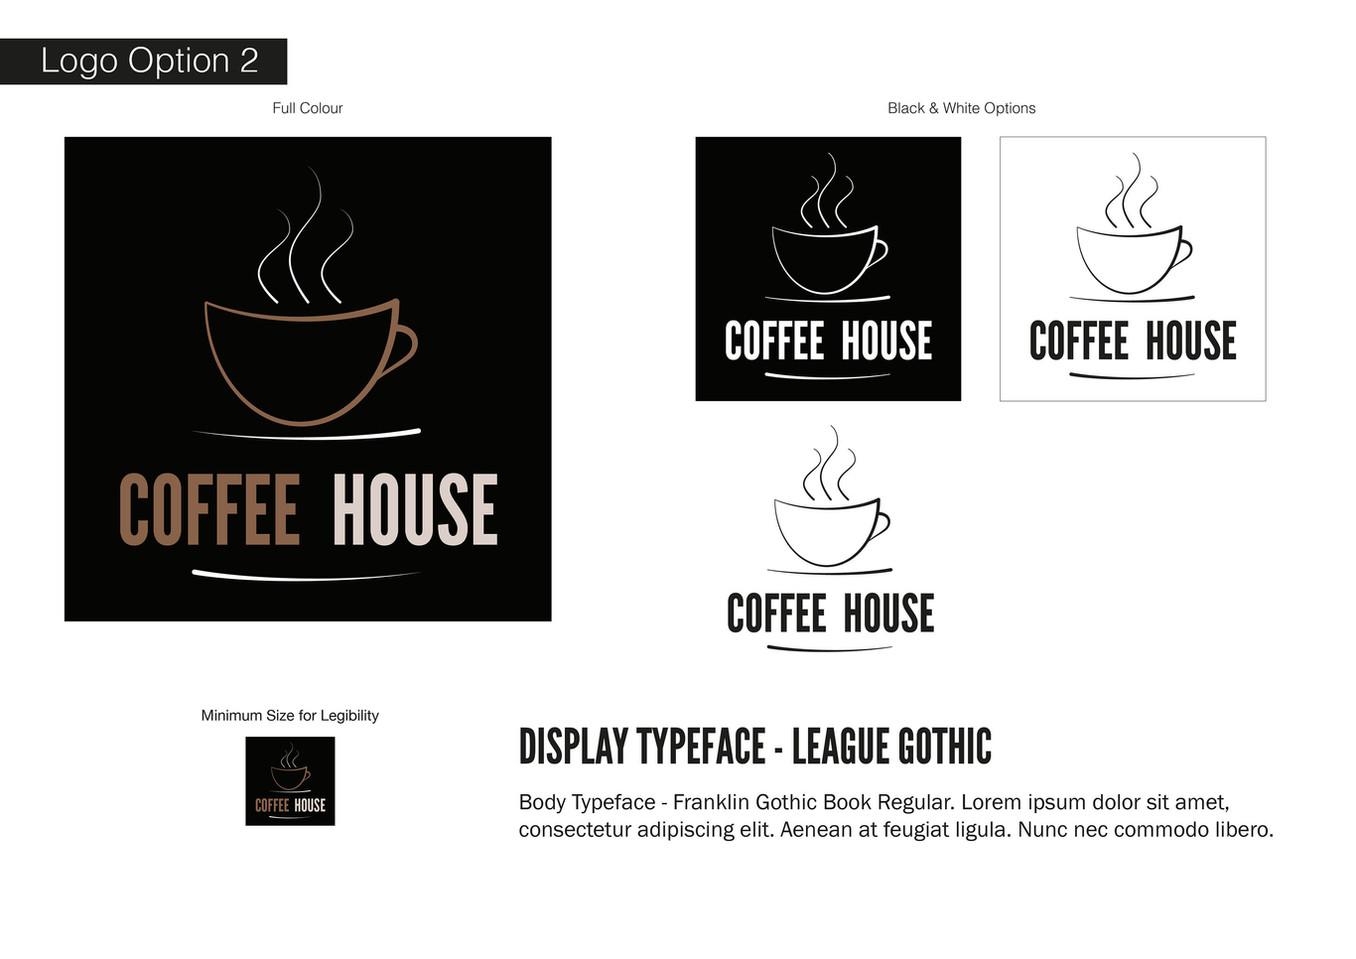 Coffee House Visual Identity - Development 2